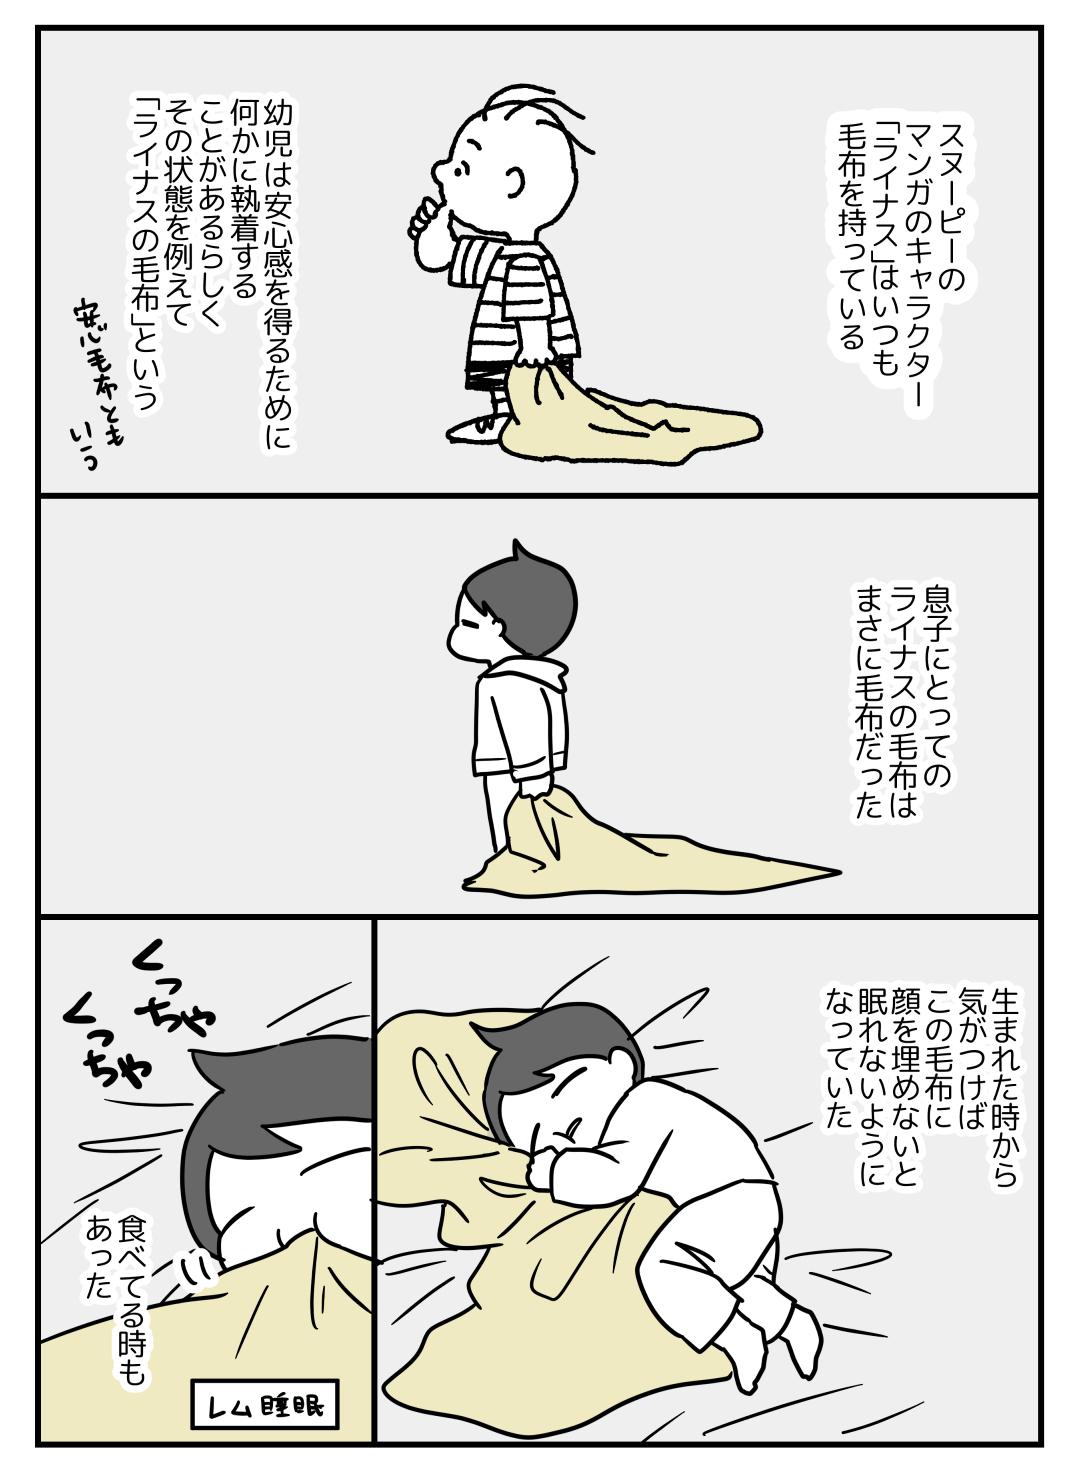 f:id:kanemotonomukuu:20181207135213j:plain